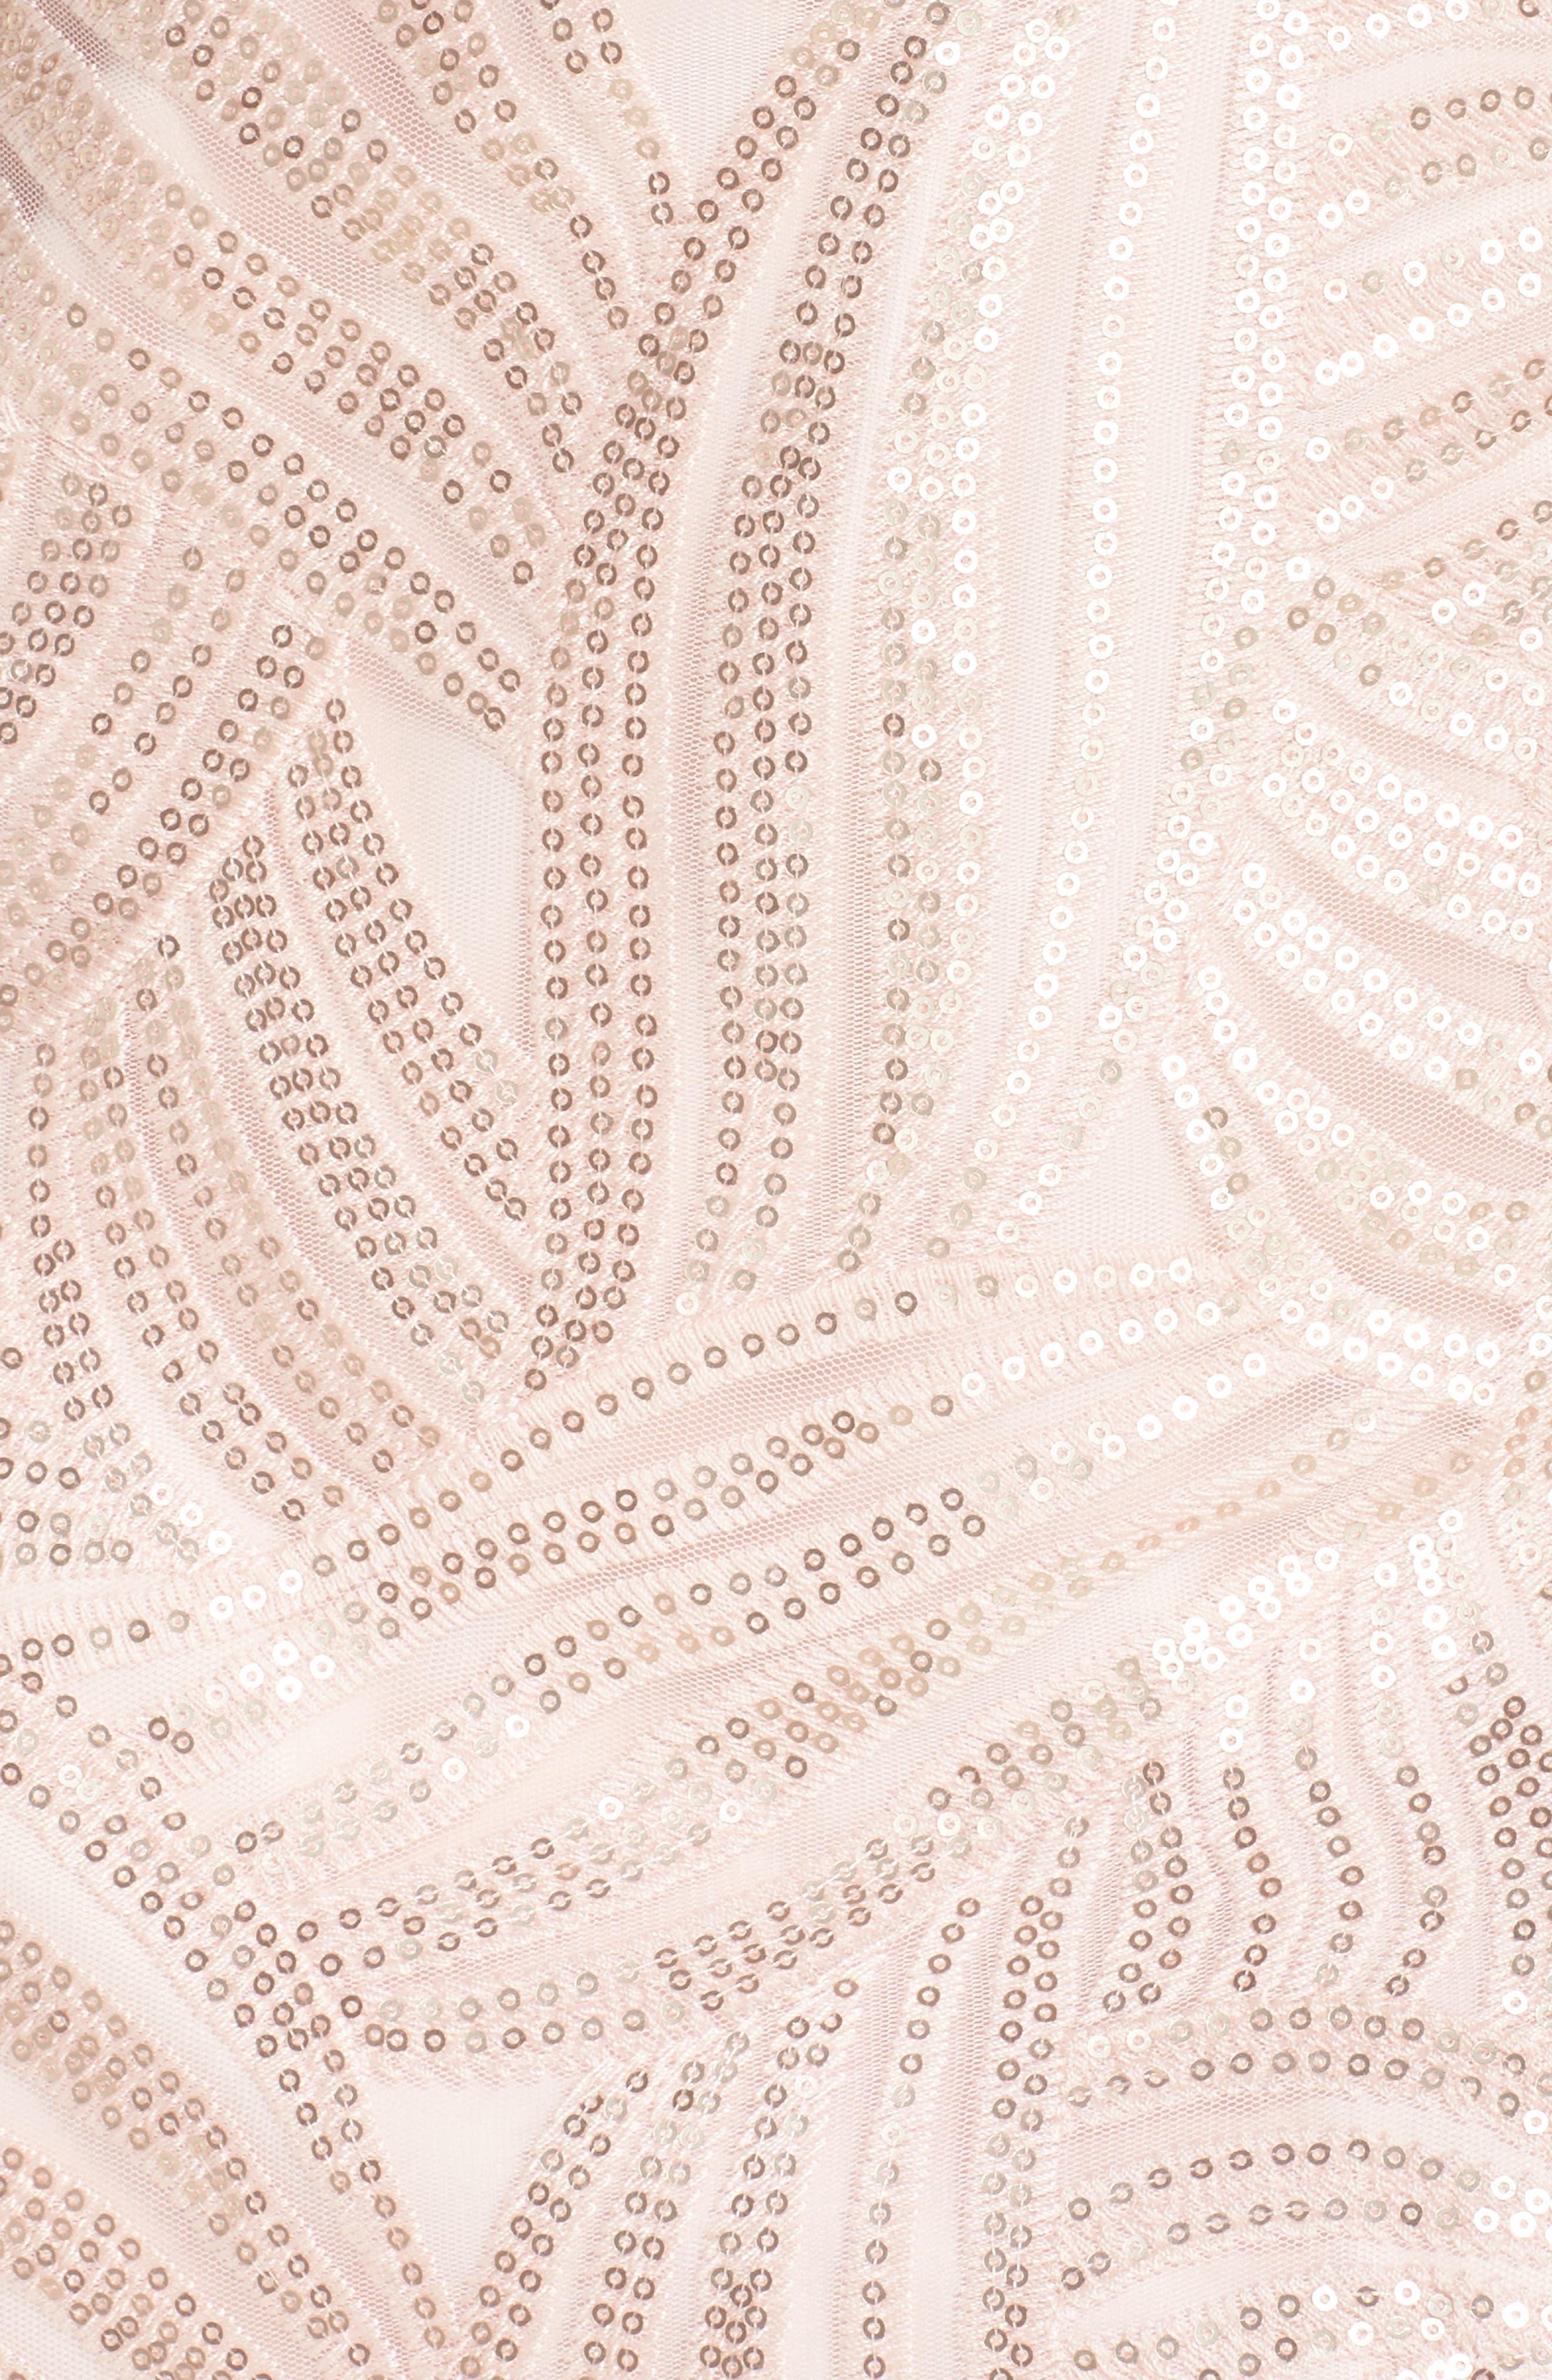 Sleeveless Sequin Sheath Dress,                             Alternate thumbnail 5, color,                             Light Pink